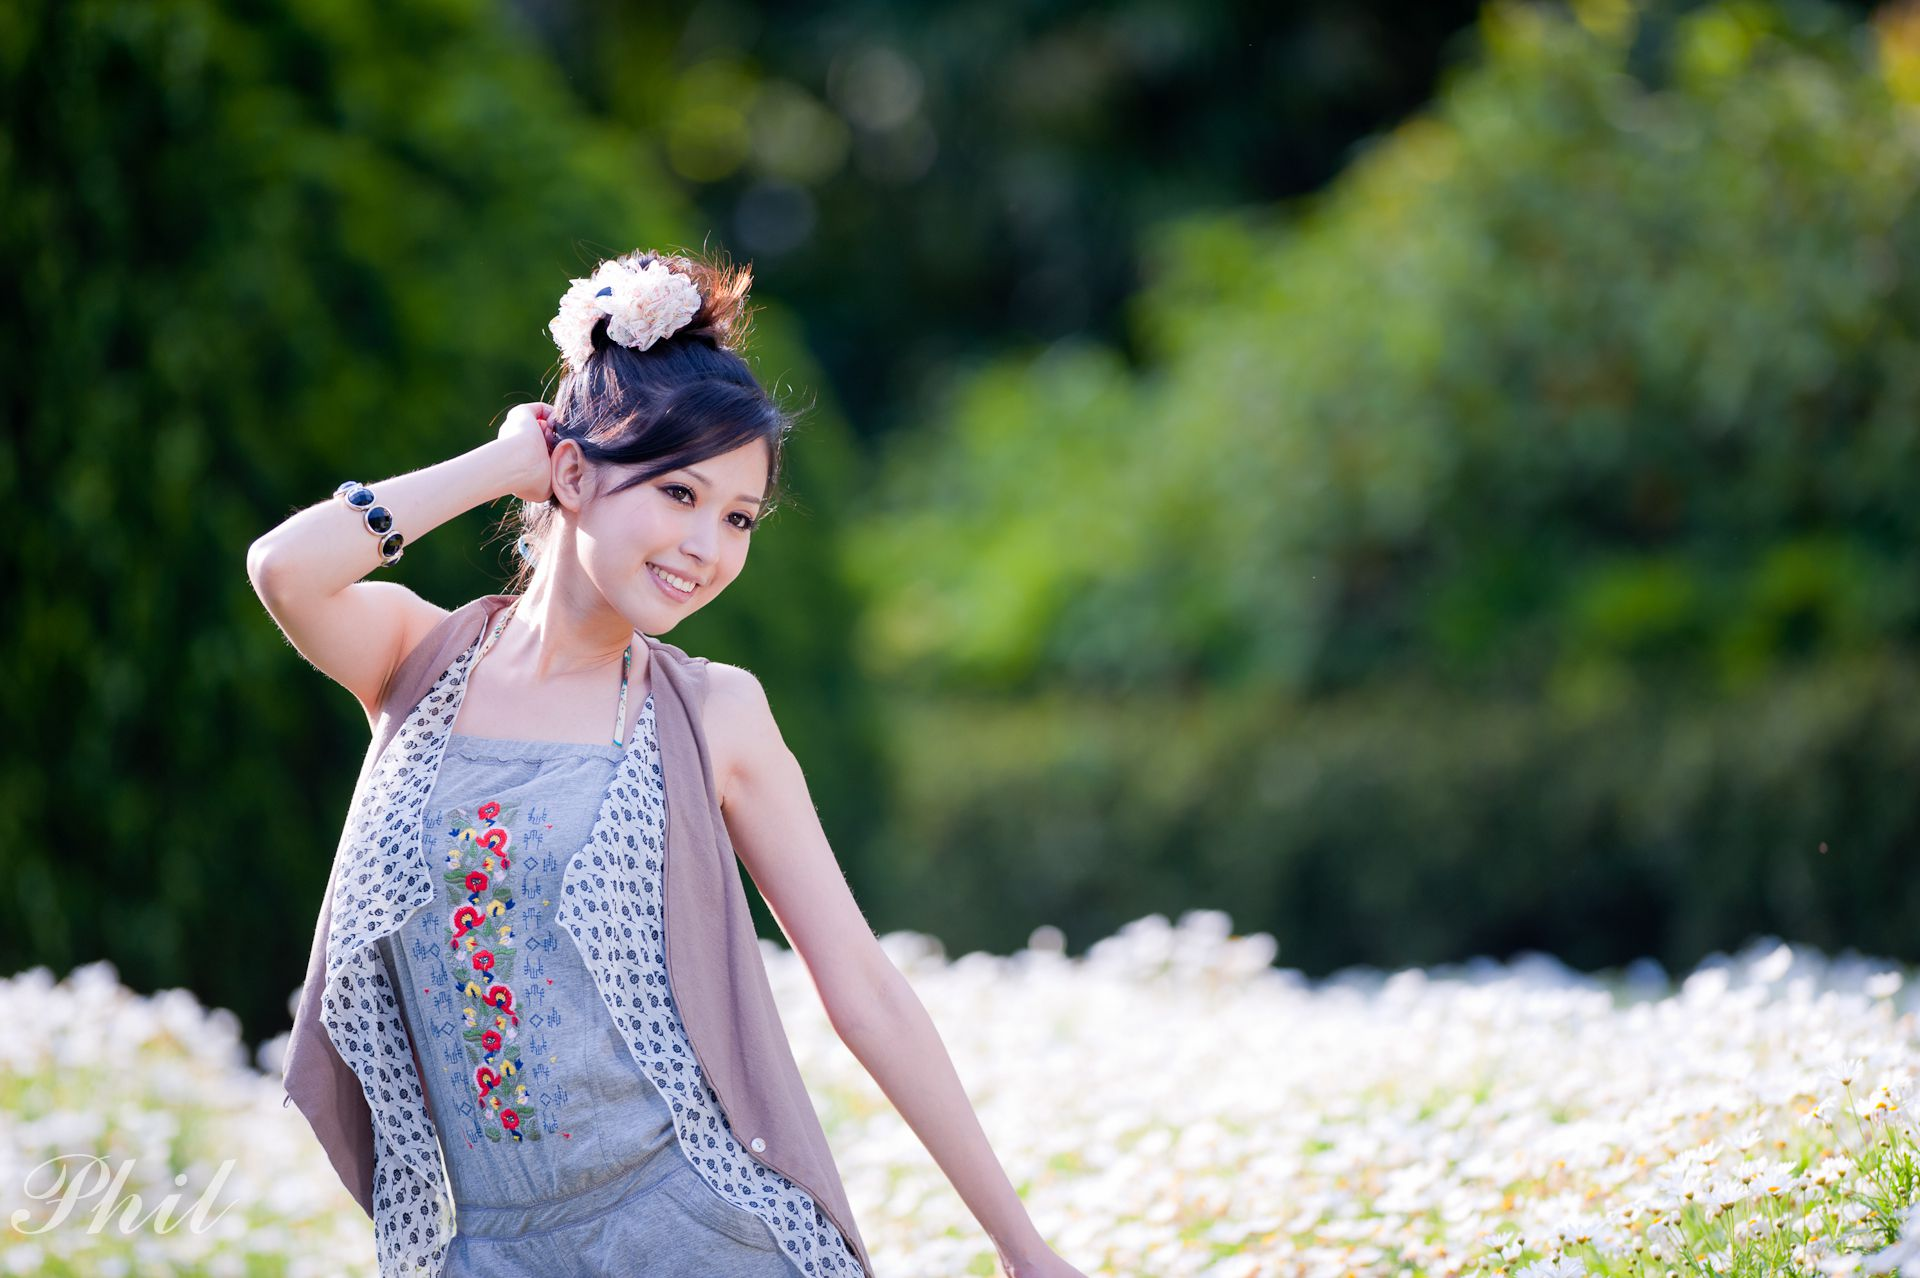 VOL.637 [台湾正妹]清新唯美女神外拍正妹养眼:杜可薇(腿模Avy,恬小鱼)高品质写真套图(157P)